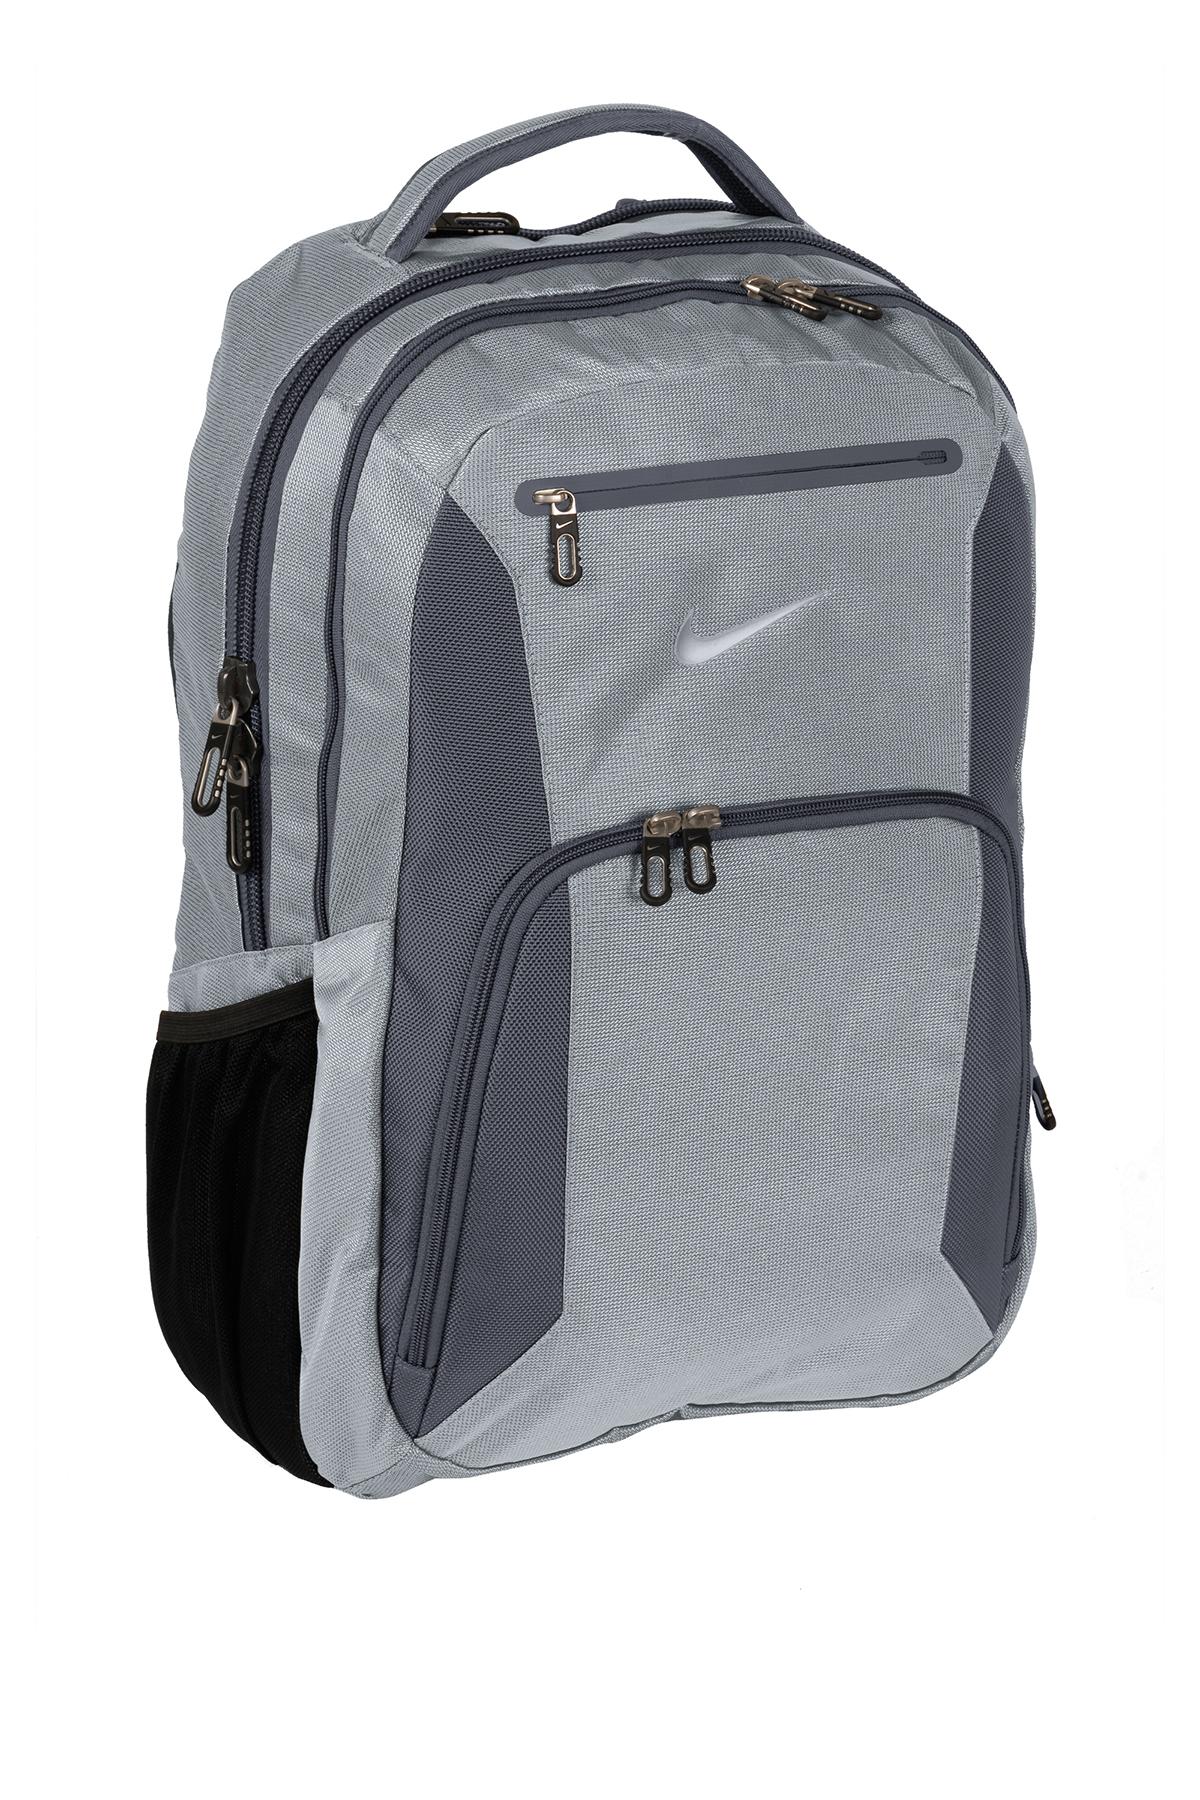 Nike Elite Backpack   Backpacks   Bags   SanMar edbef6559e